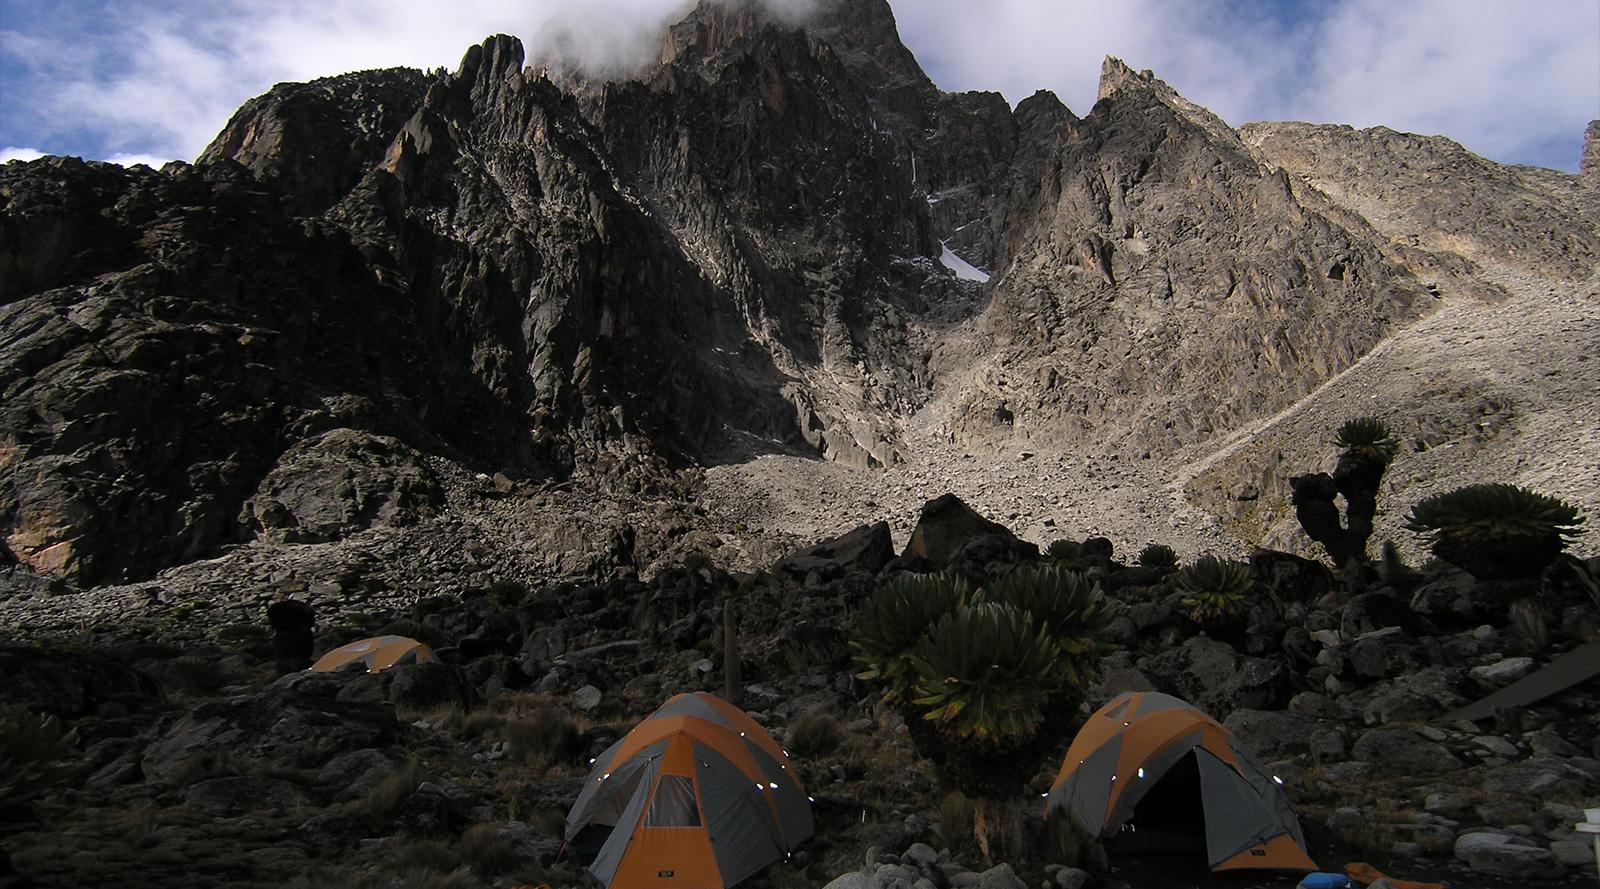 © Ol Pejeta Bush Camp | Ol Pejeta Bush Camp, Camping sul Monte Kenya, Kenya